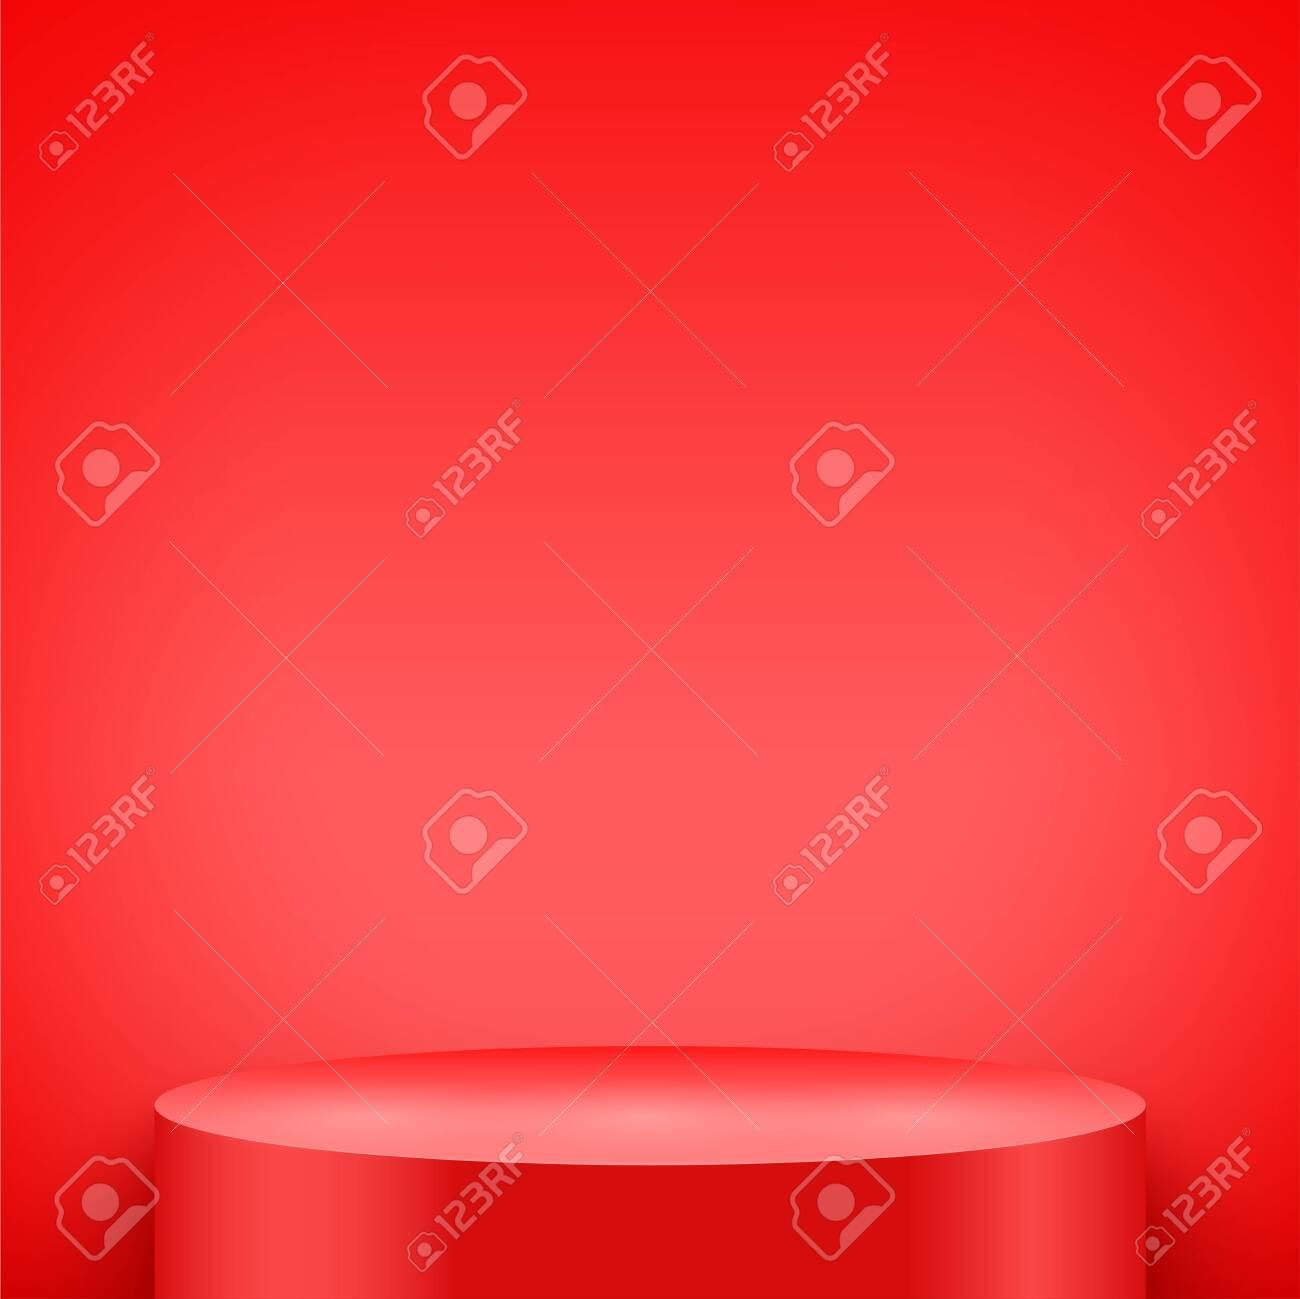 Light box with Red presentation circle podium on light backdrop. Editable Background Vector illustration. - 138193035